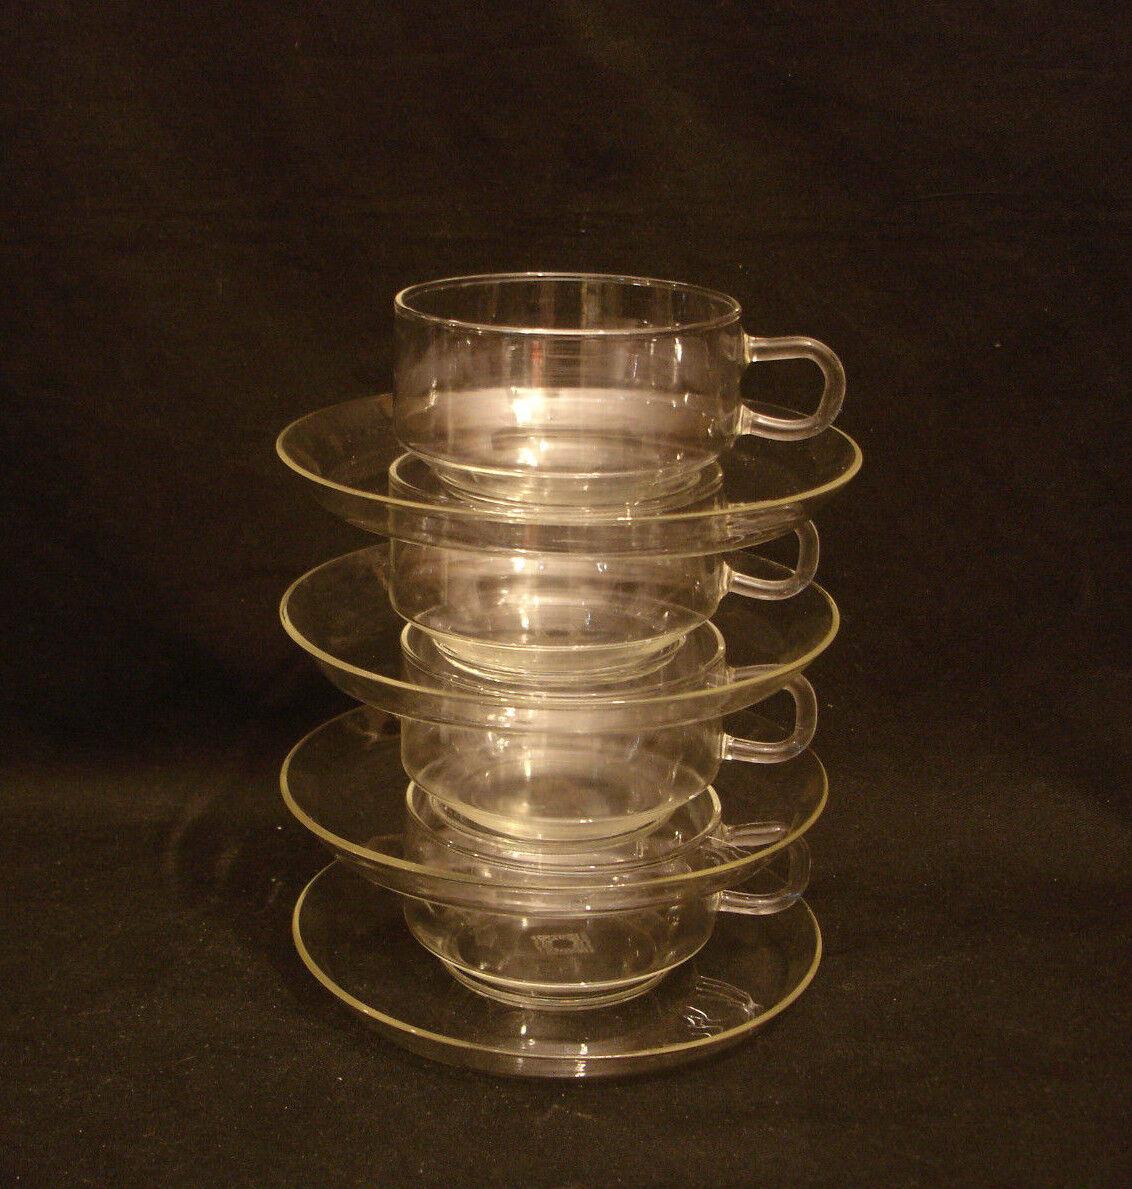 JSCHOTT JENA GLASS CUP & SAUCER 3 1 4  DIAMETER   MADE IN GERMANY   SET OF 4